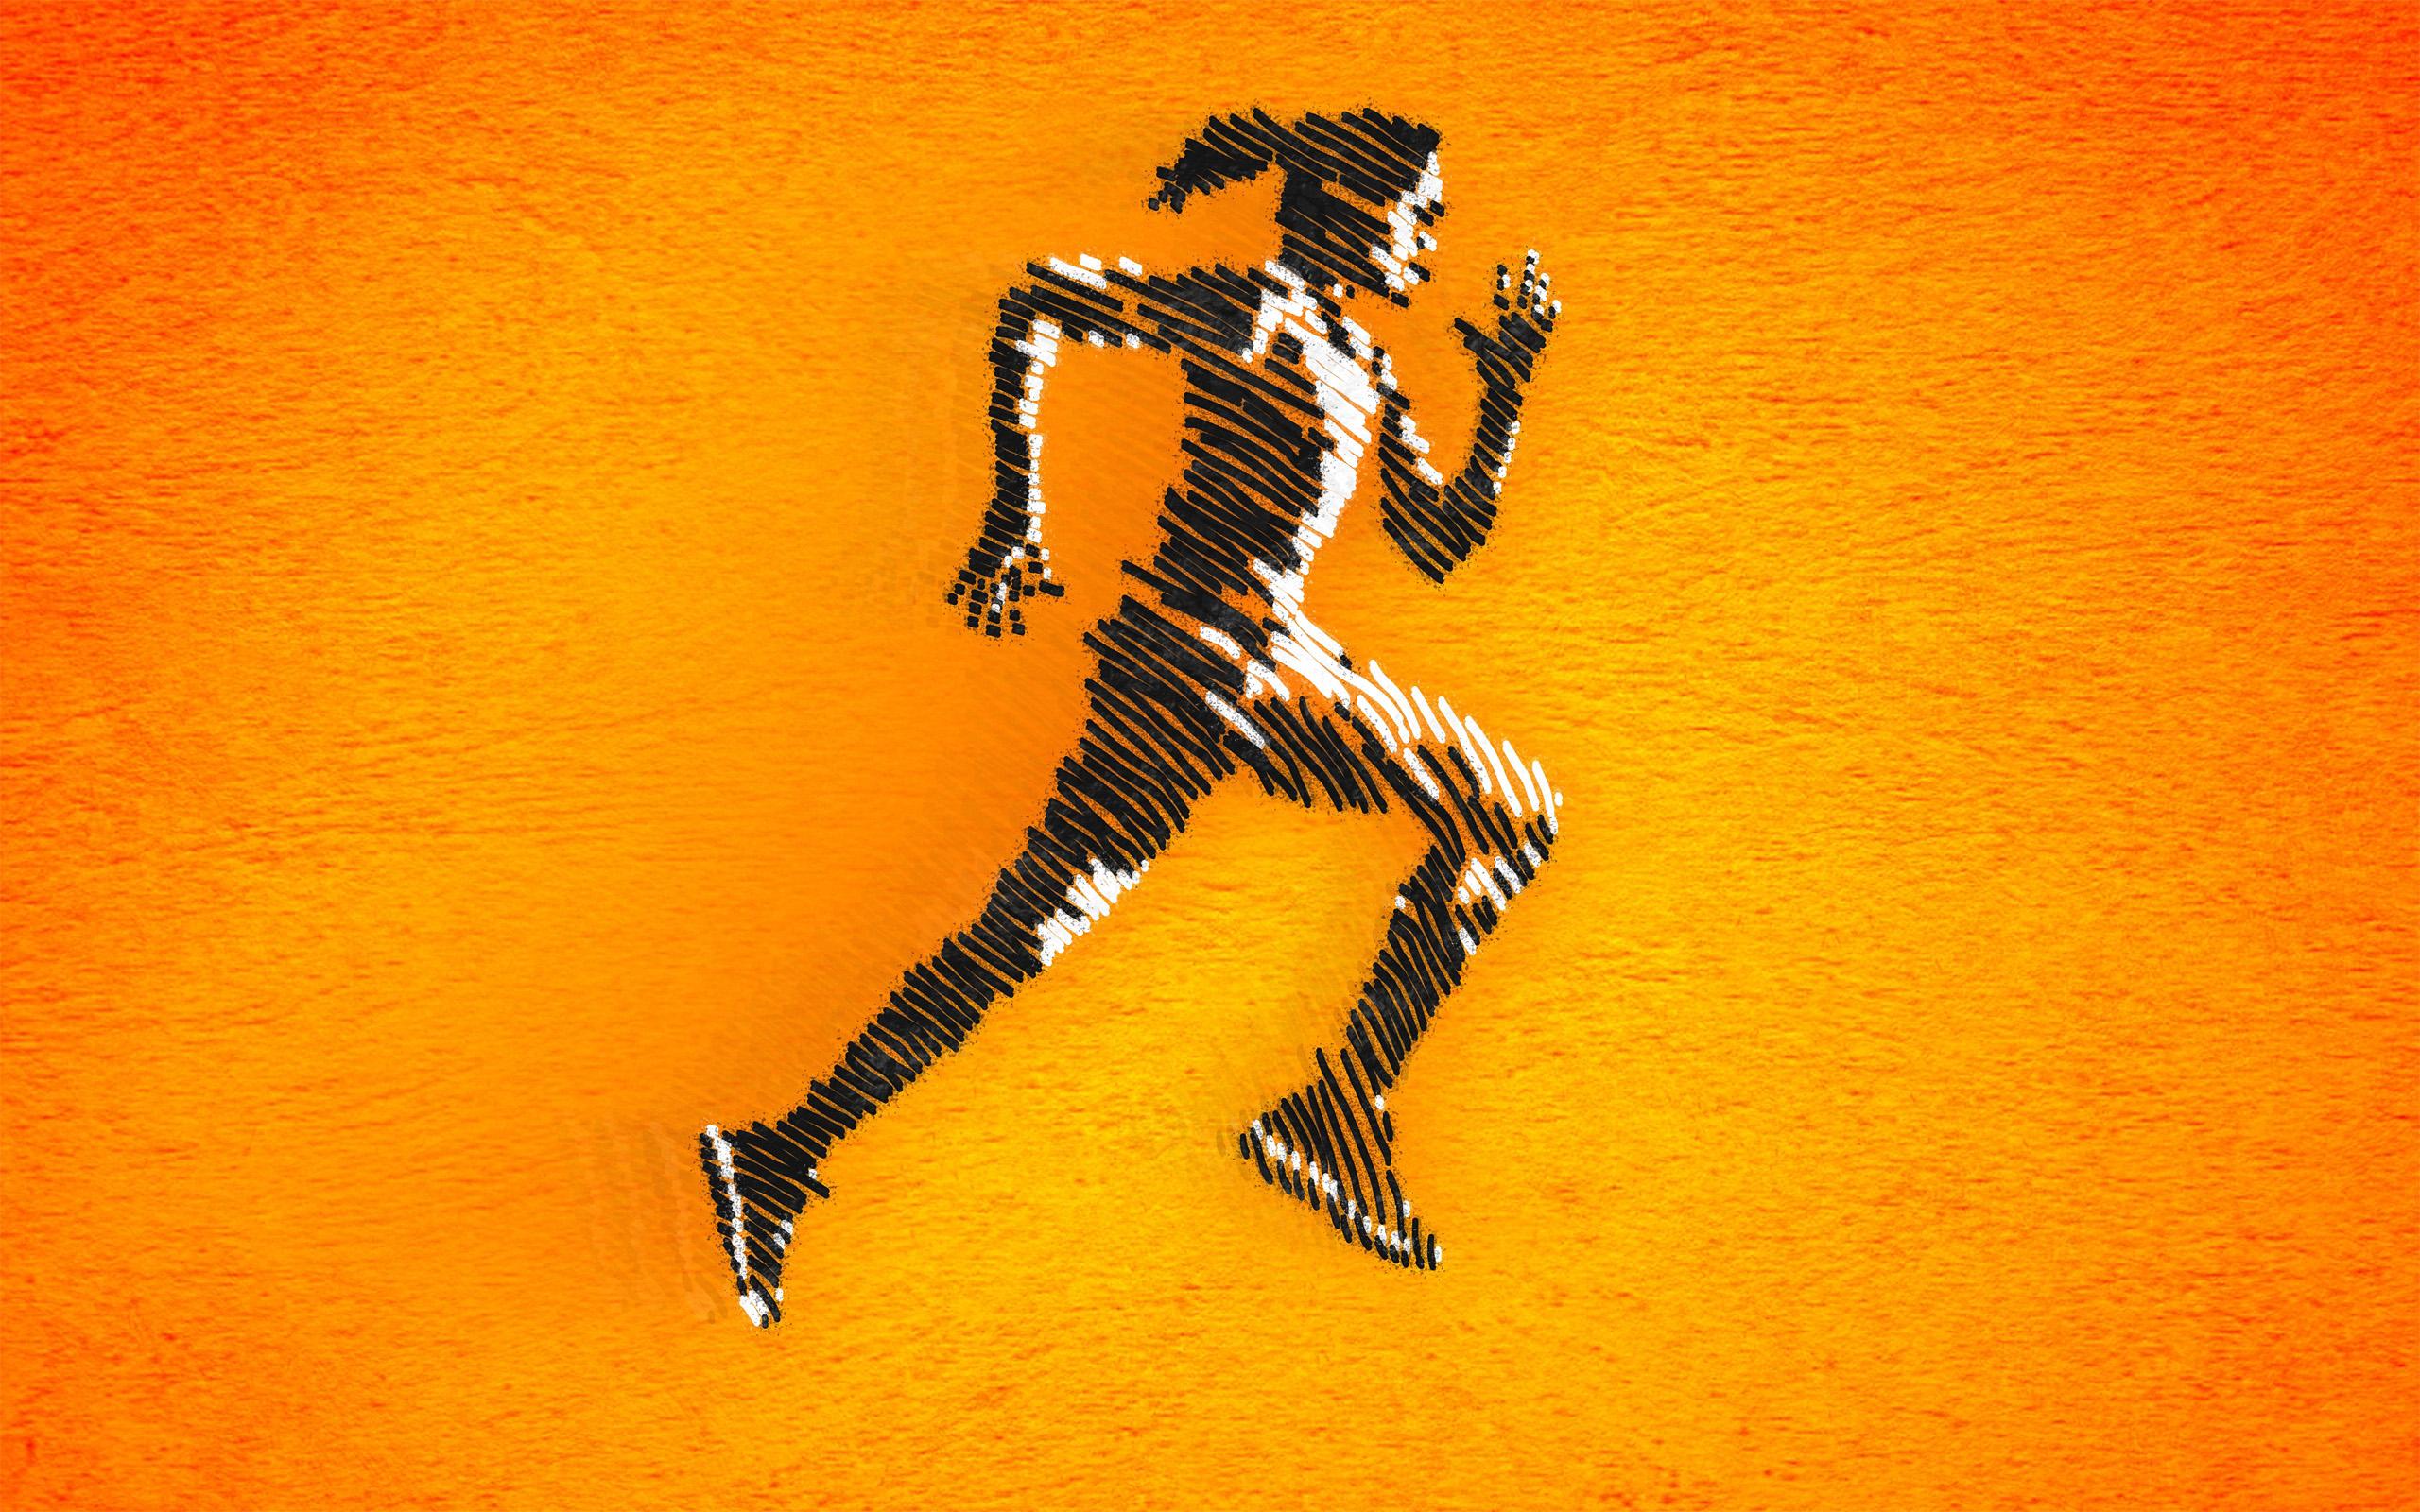 Born to run - female athlete sprinting photo